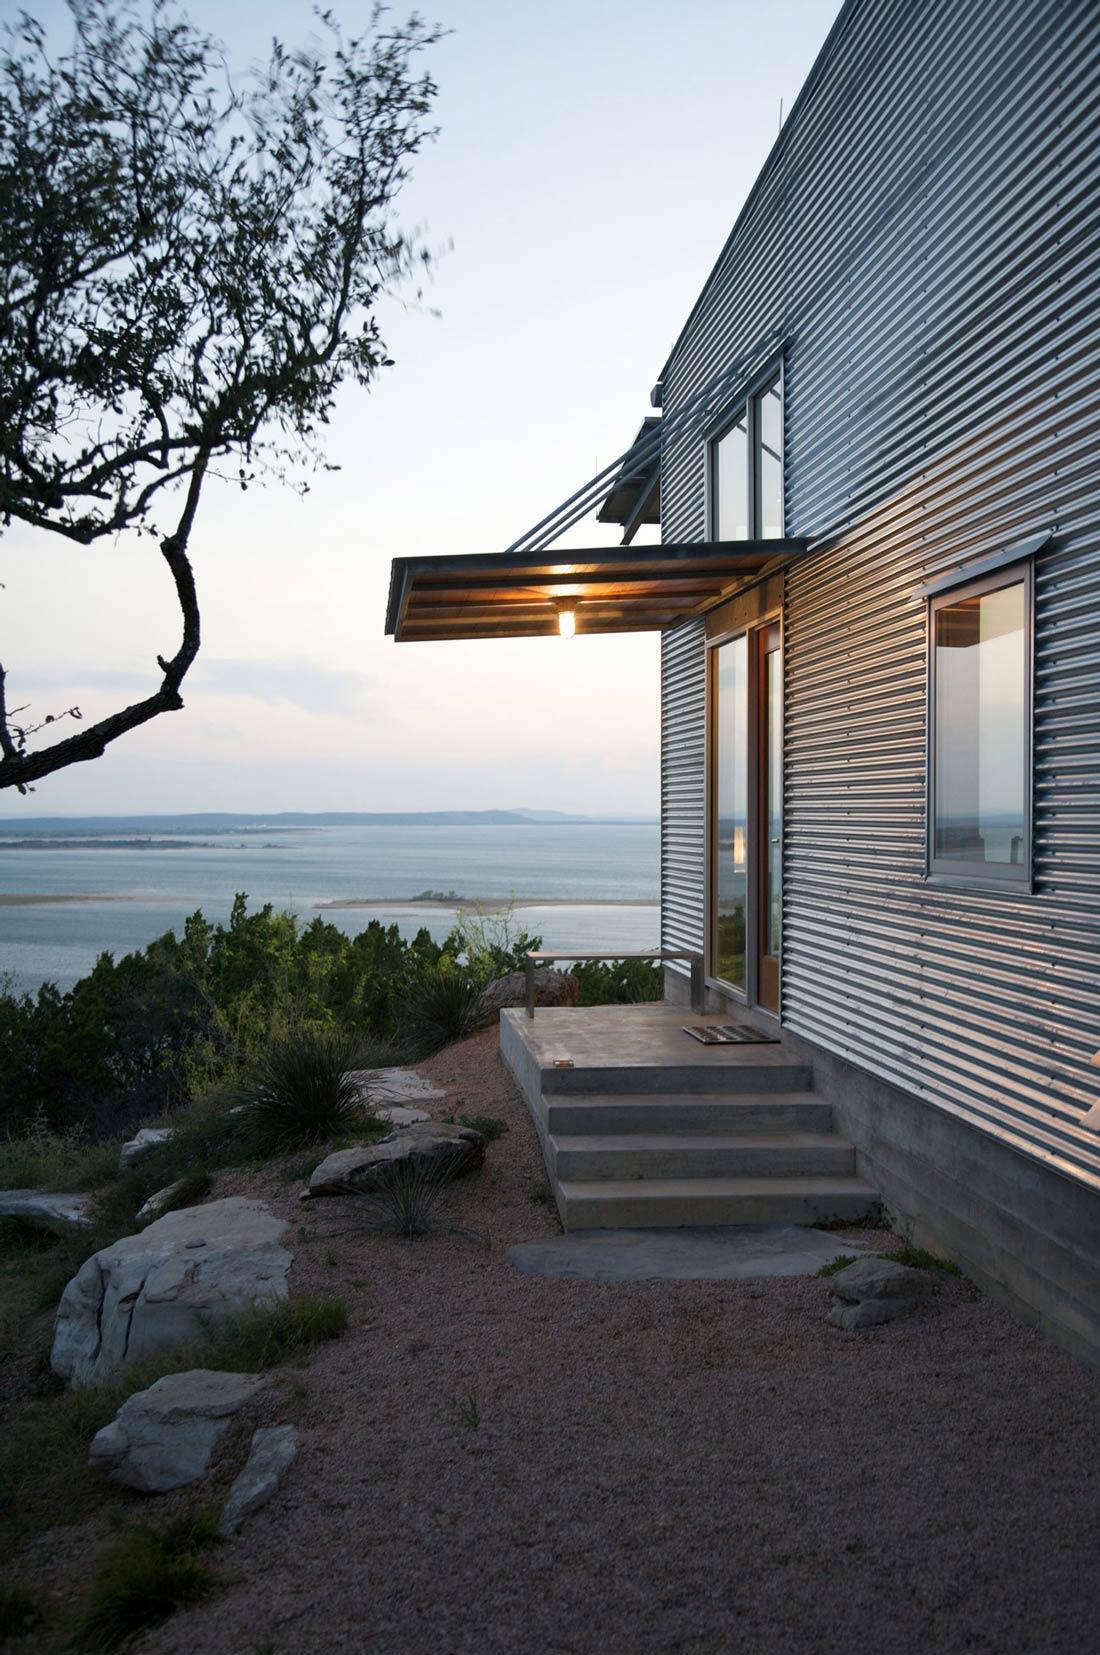 Porch Light, Entrance, Lake Views, Simple Eco-Friendly Home Perched Above Lake Buchanan, Texas